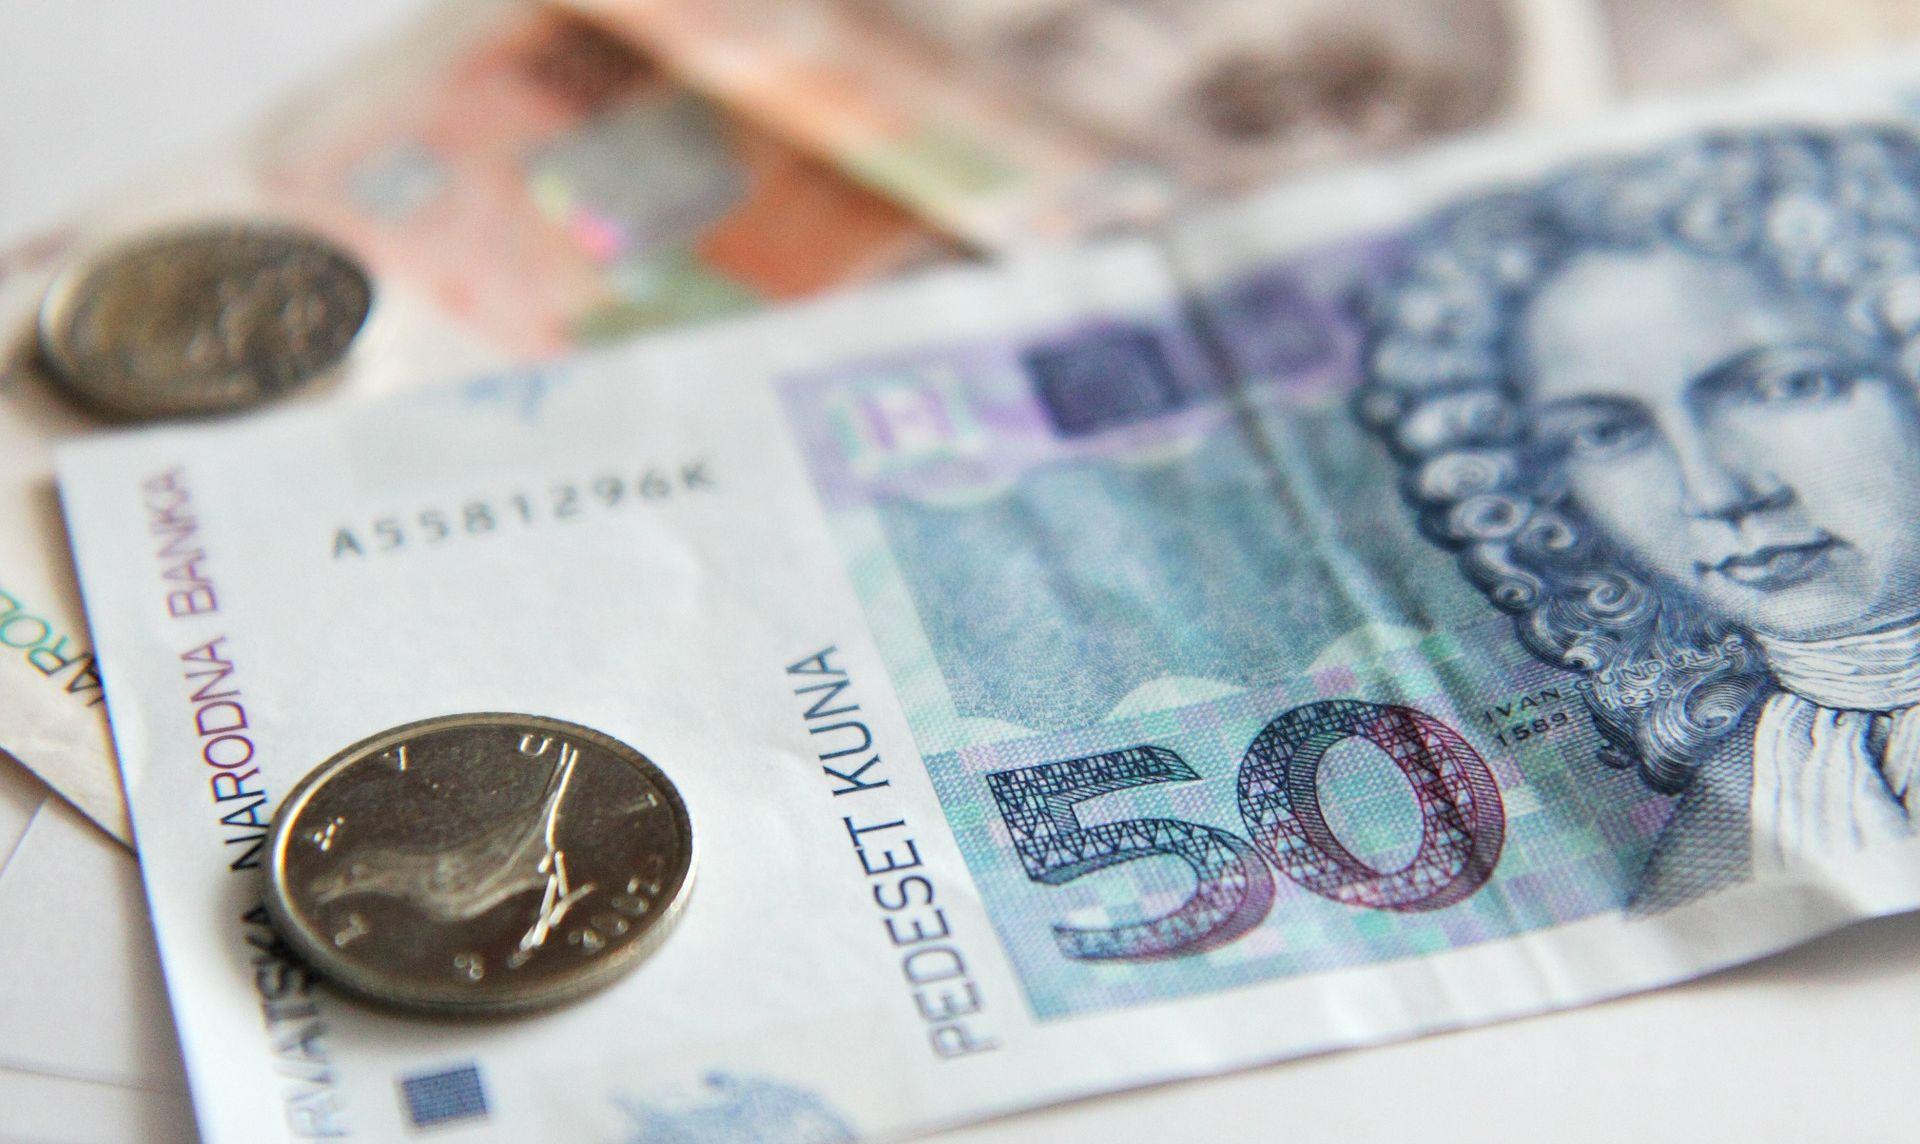 FINA Do kraja 2018. osobni stečaj zatražilo 1.250 građana